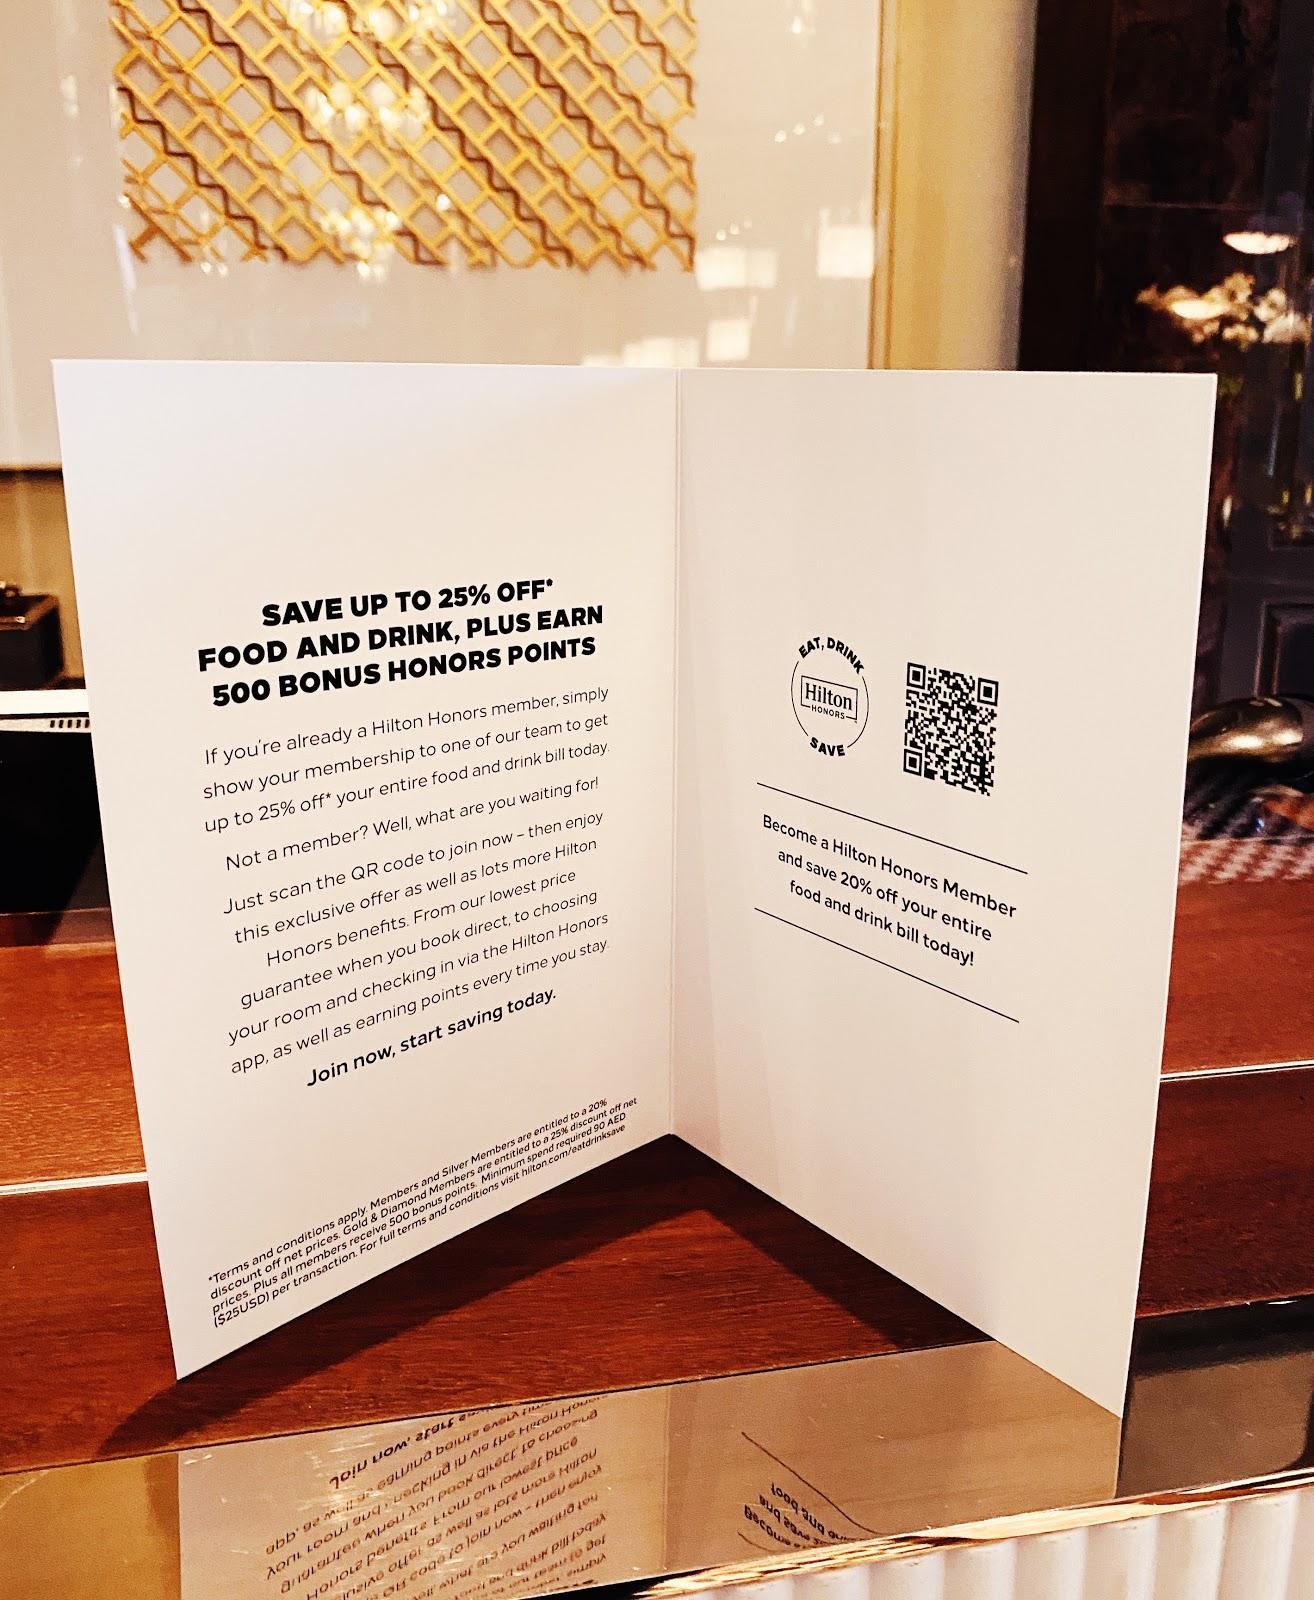 qr code on hilton menu to get a discount